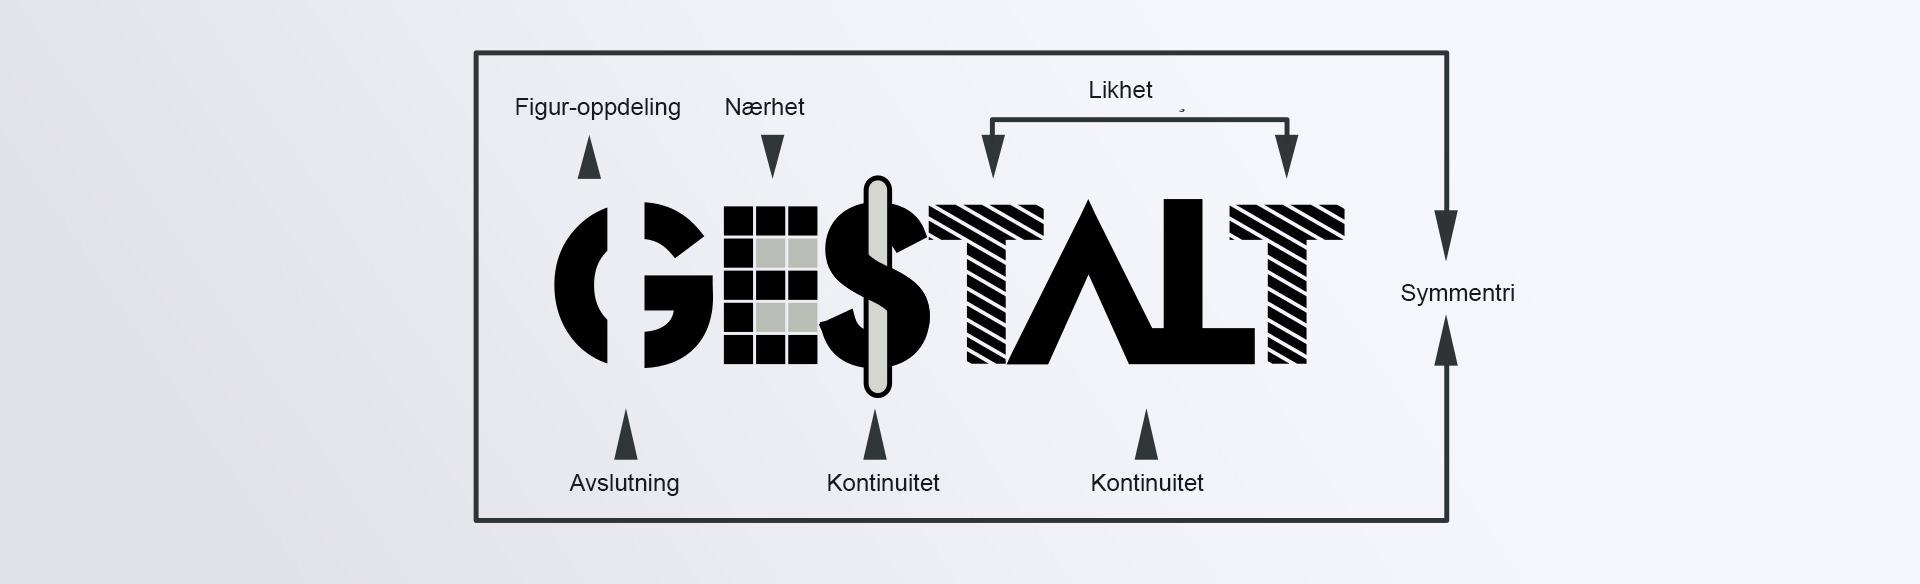 Gestaltprinsipper